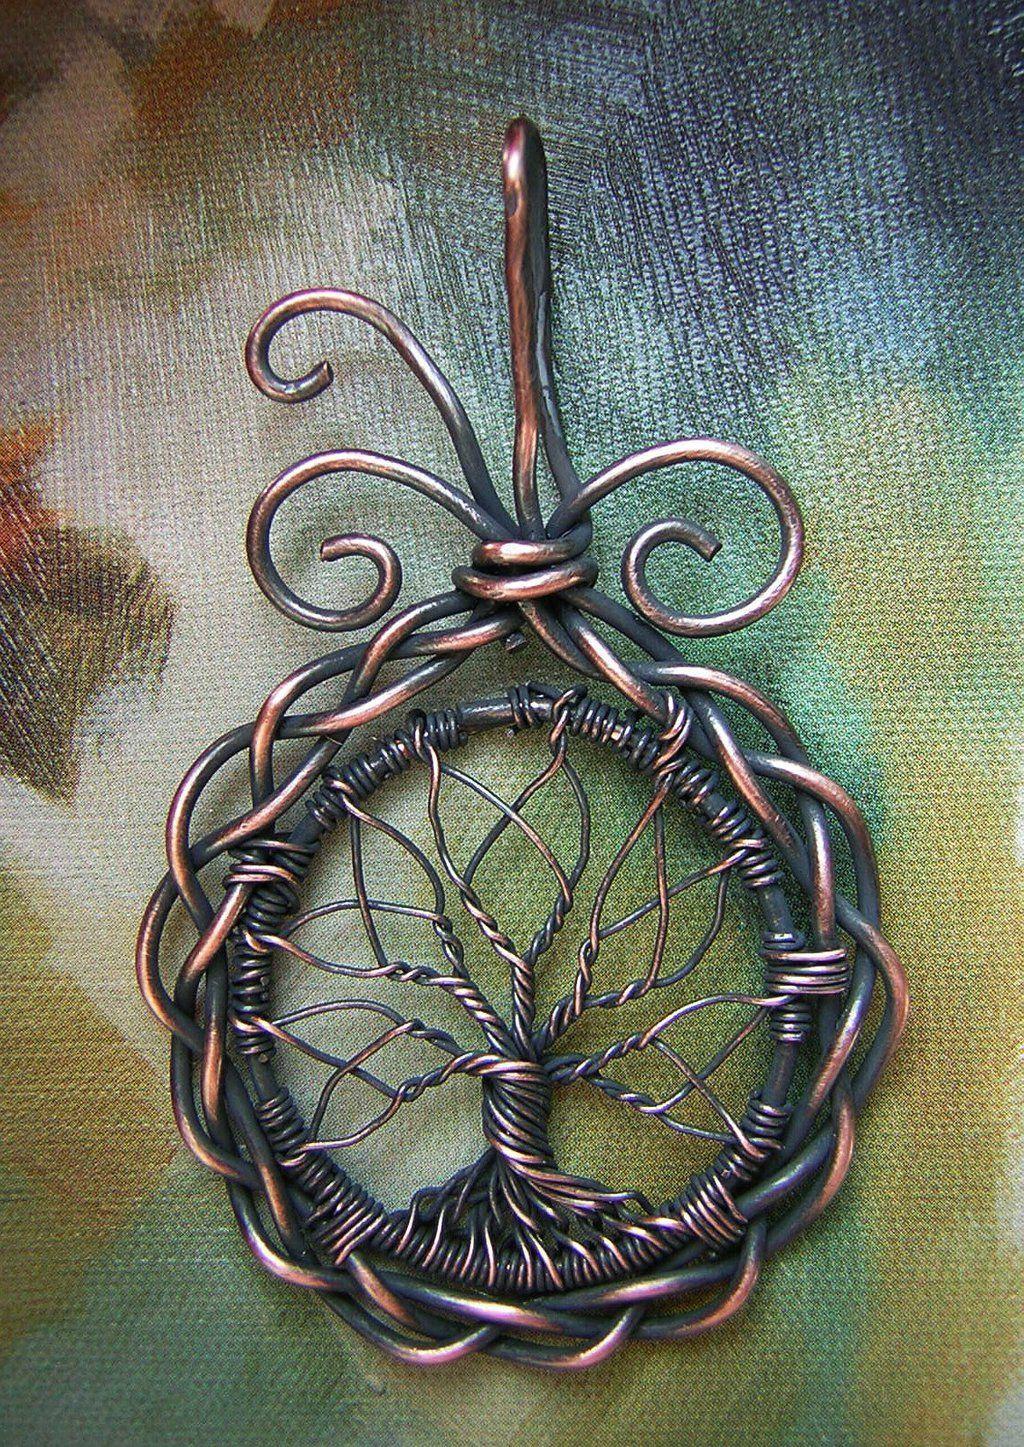 Miscellanea Etcetera: Jewelry Tutorial: Tree of Life Pendant | What ...